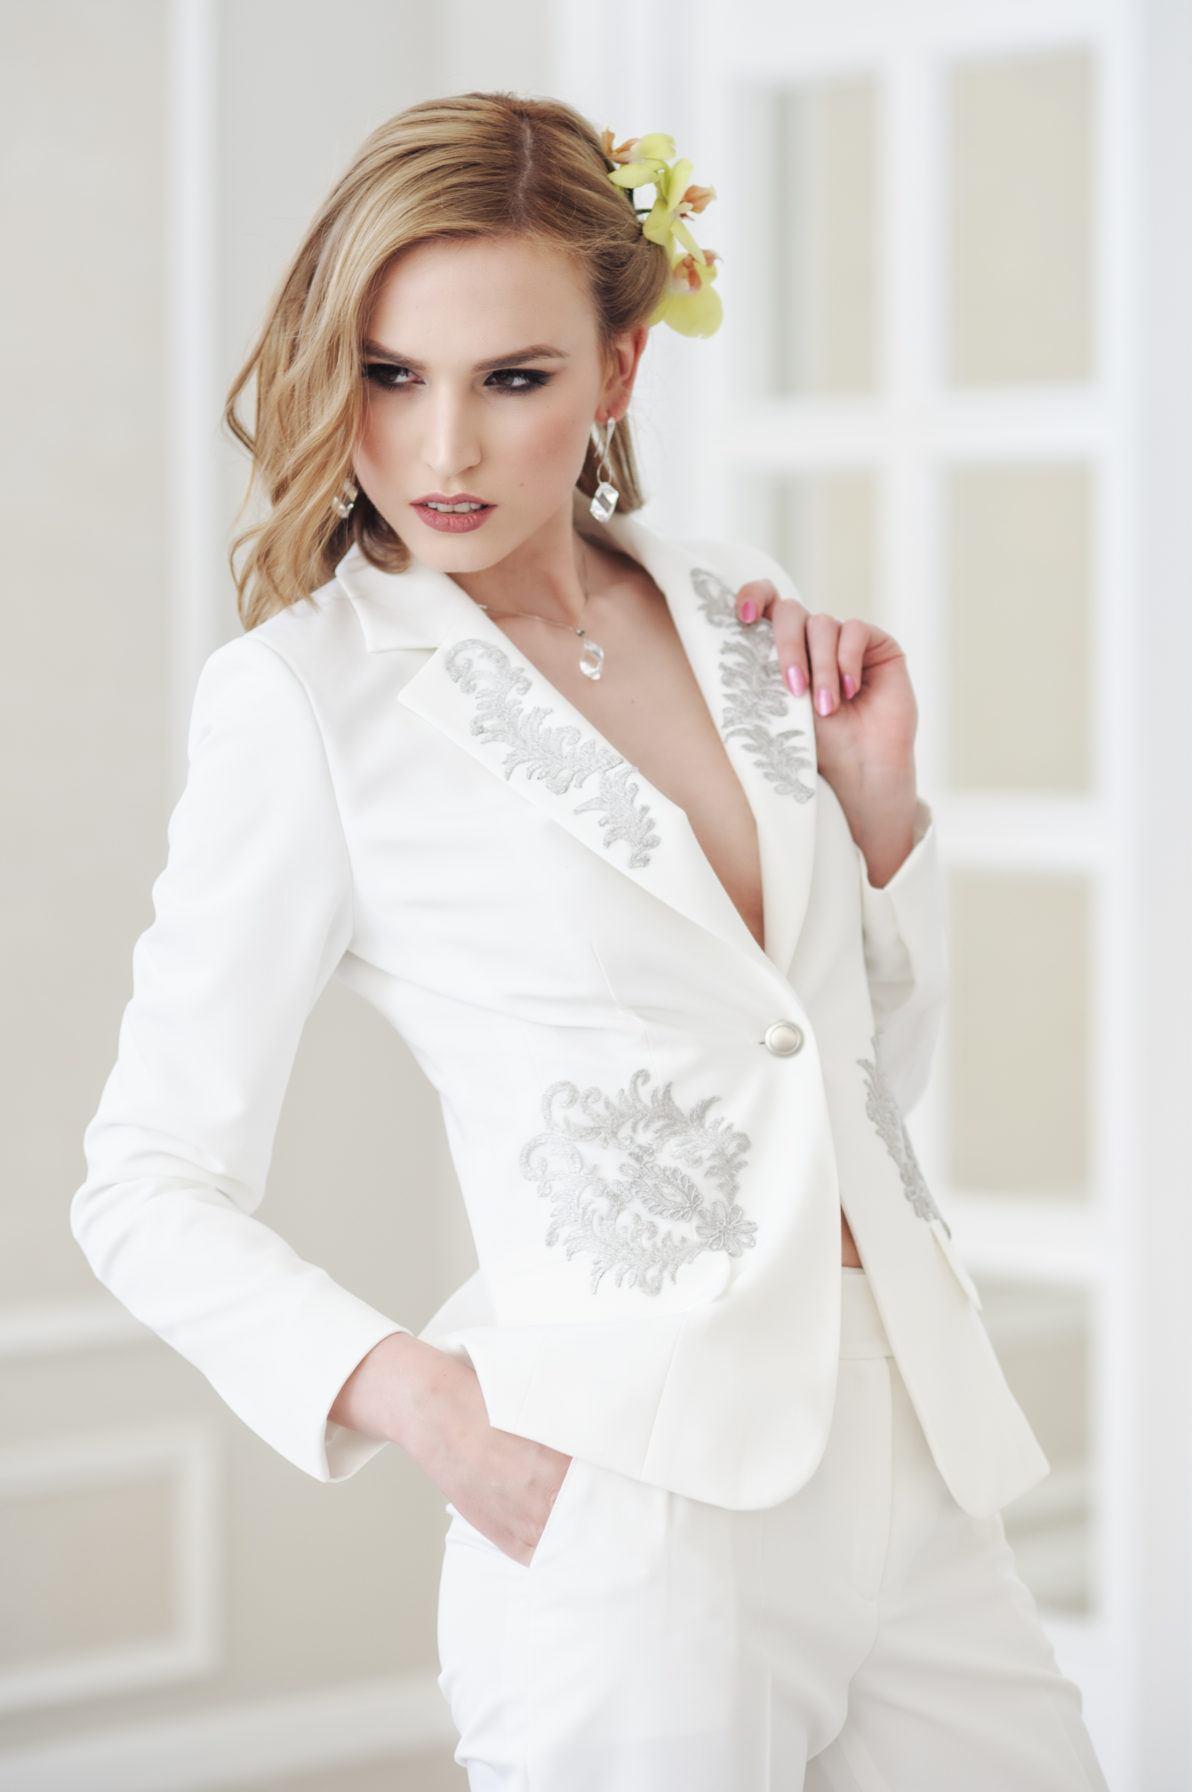 elegancka biała marynarka na jeden guzik